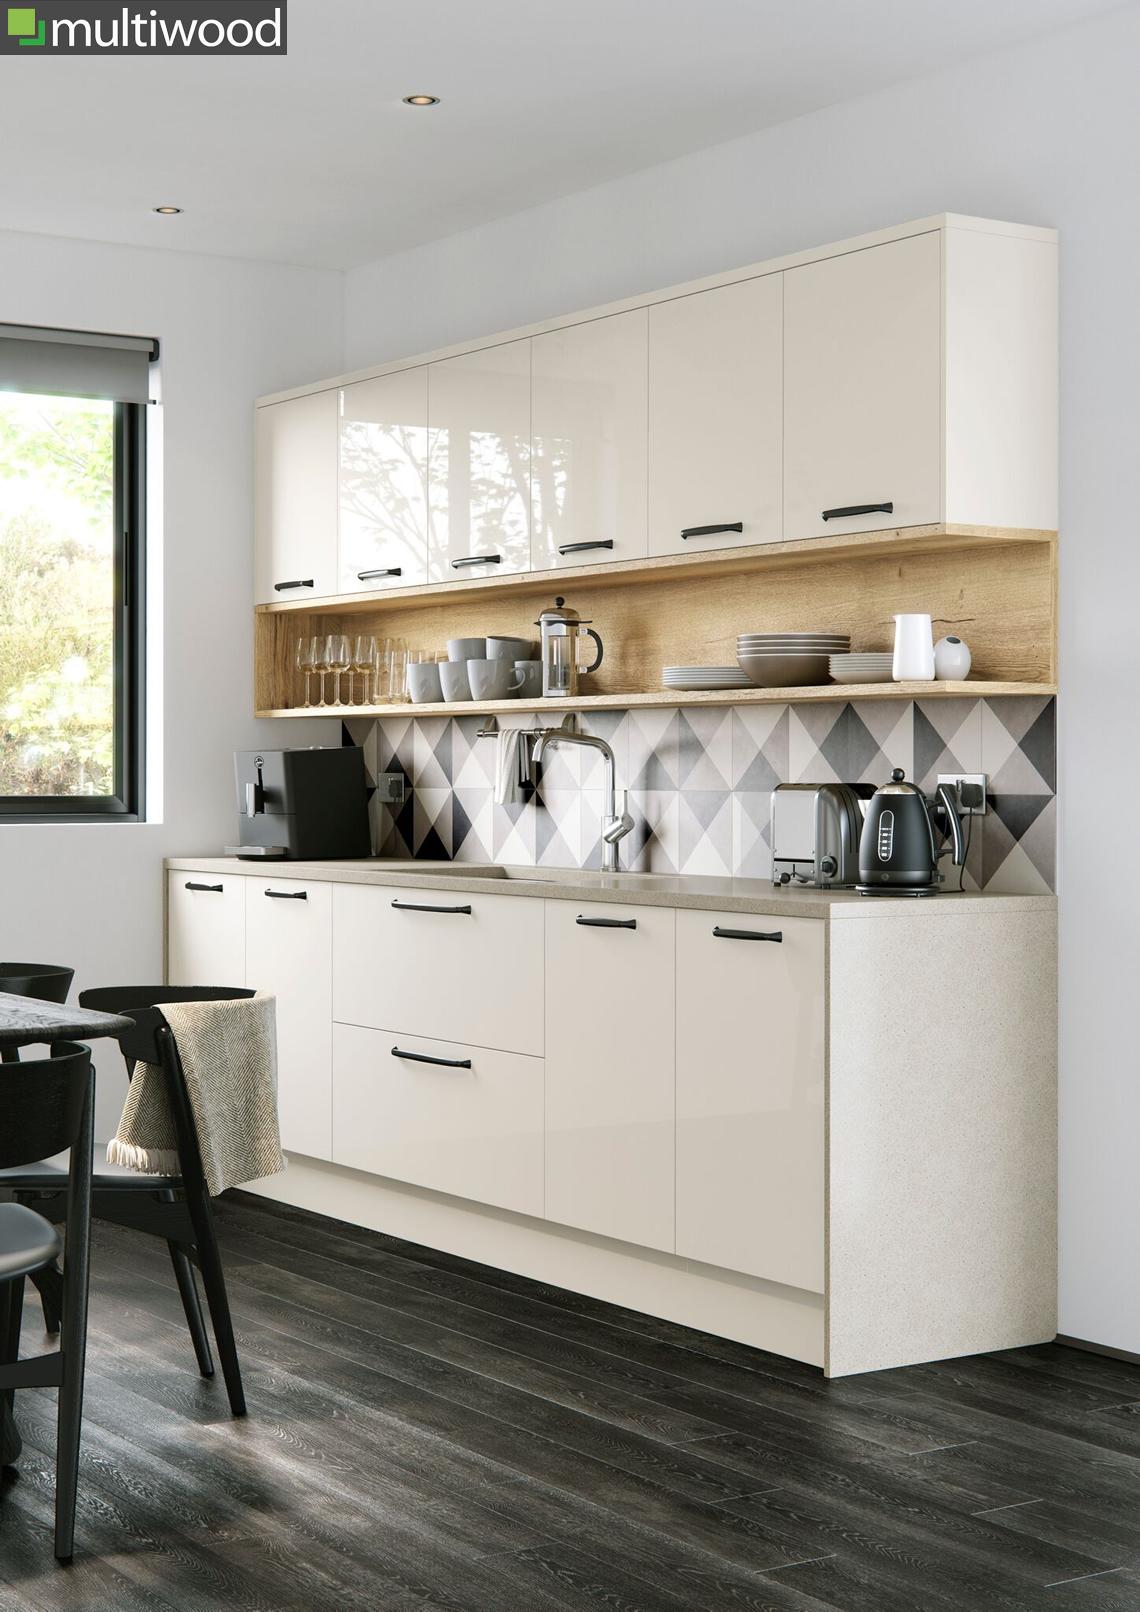 Multiwood Cosdon – Gloss Porcelain & Halifax Oak Kitchen